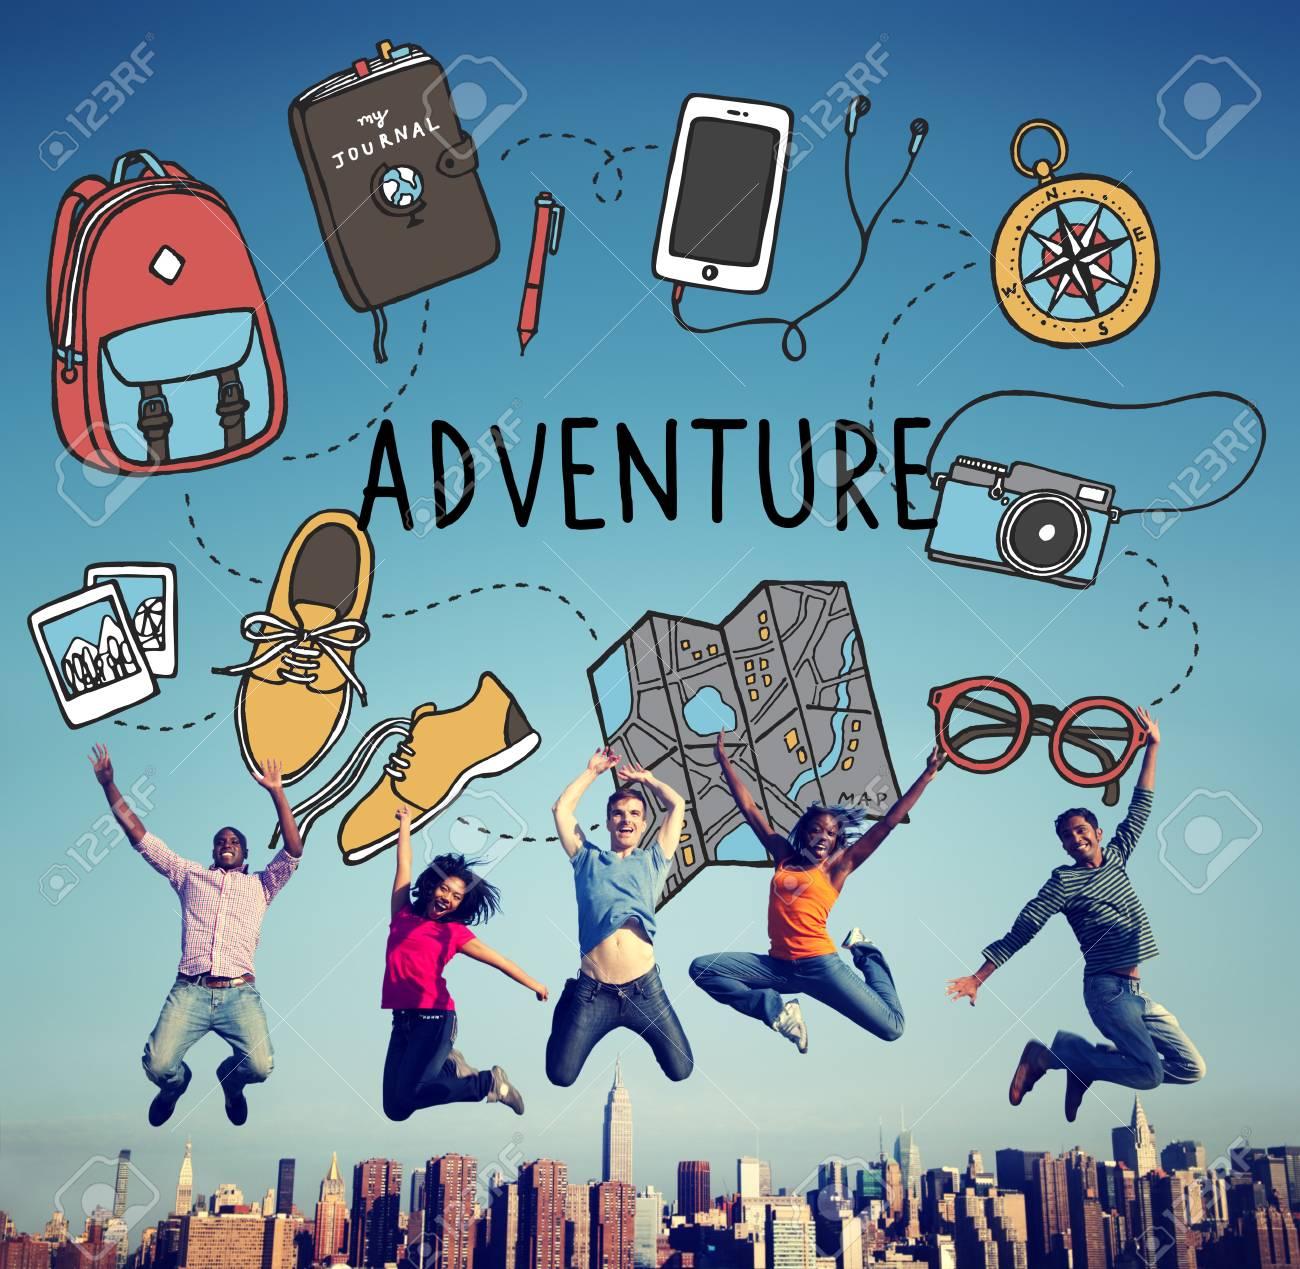 Adventure Travel Destinations Trip Holiday Concept - 54641710